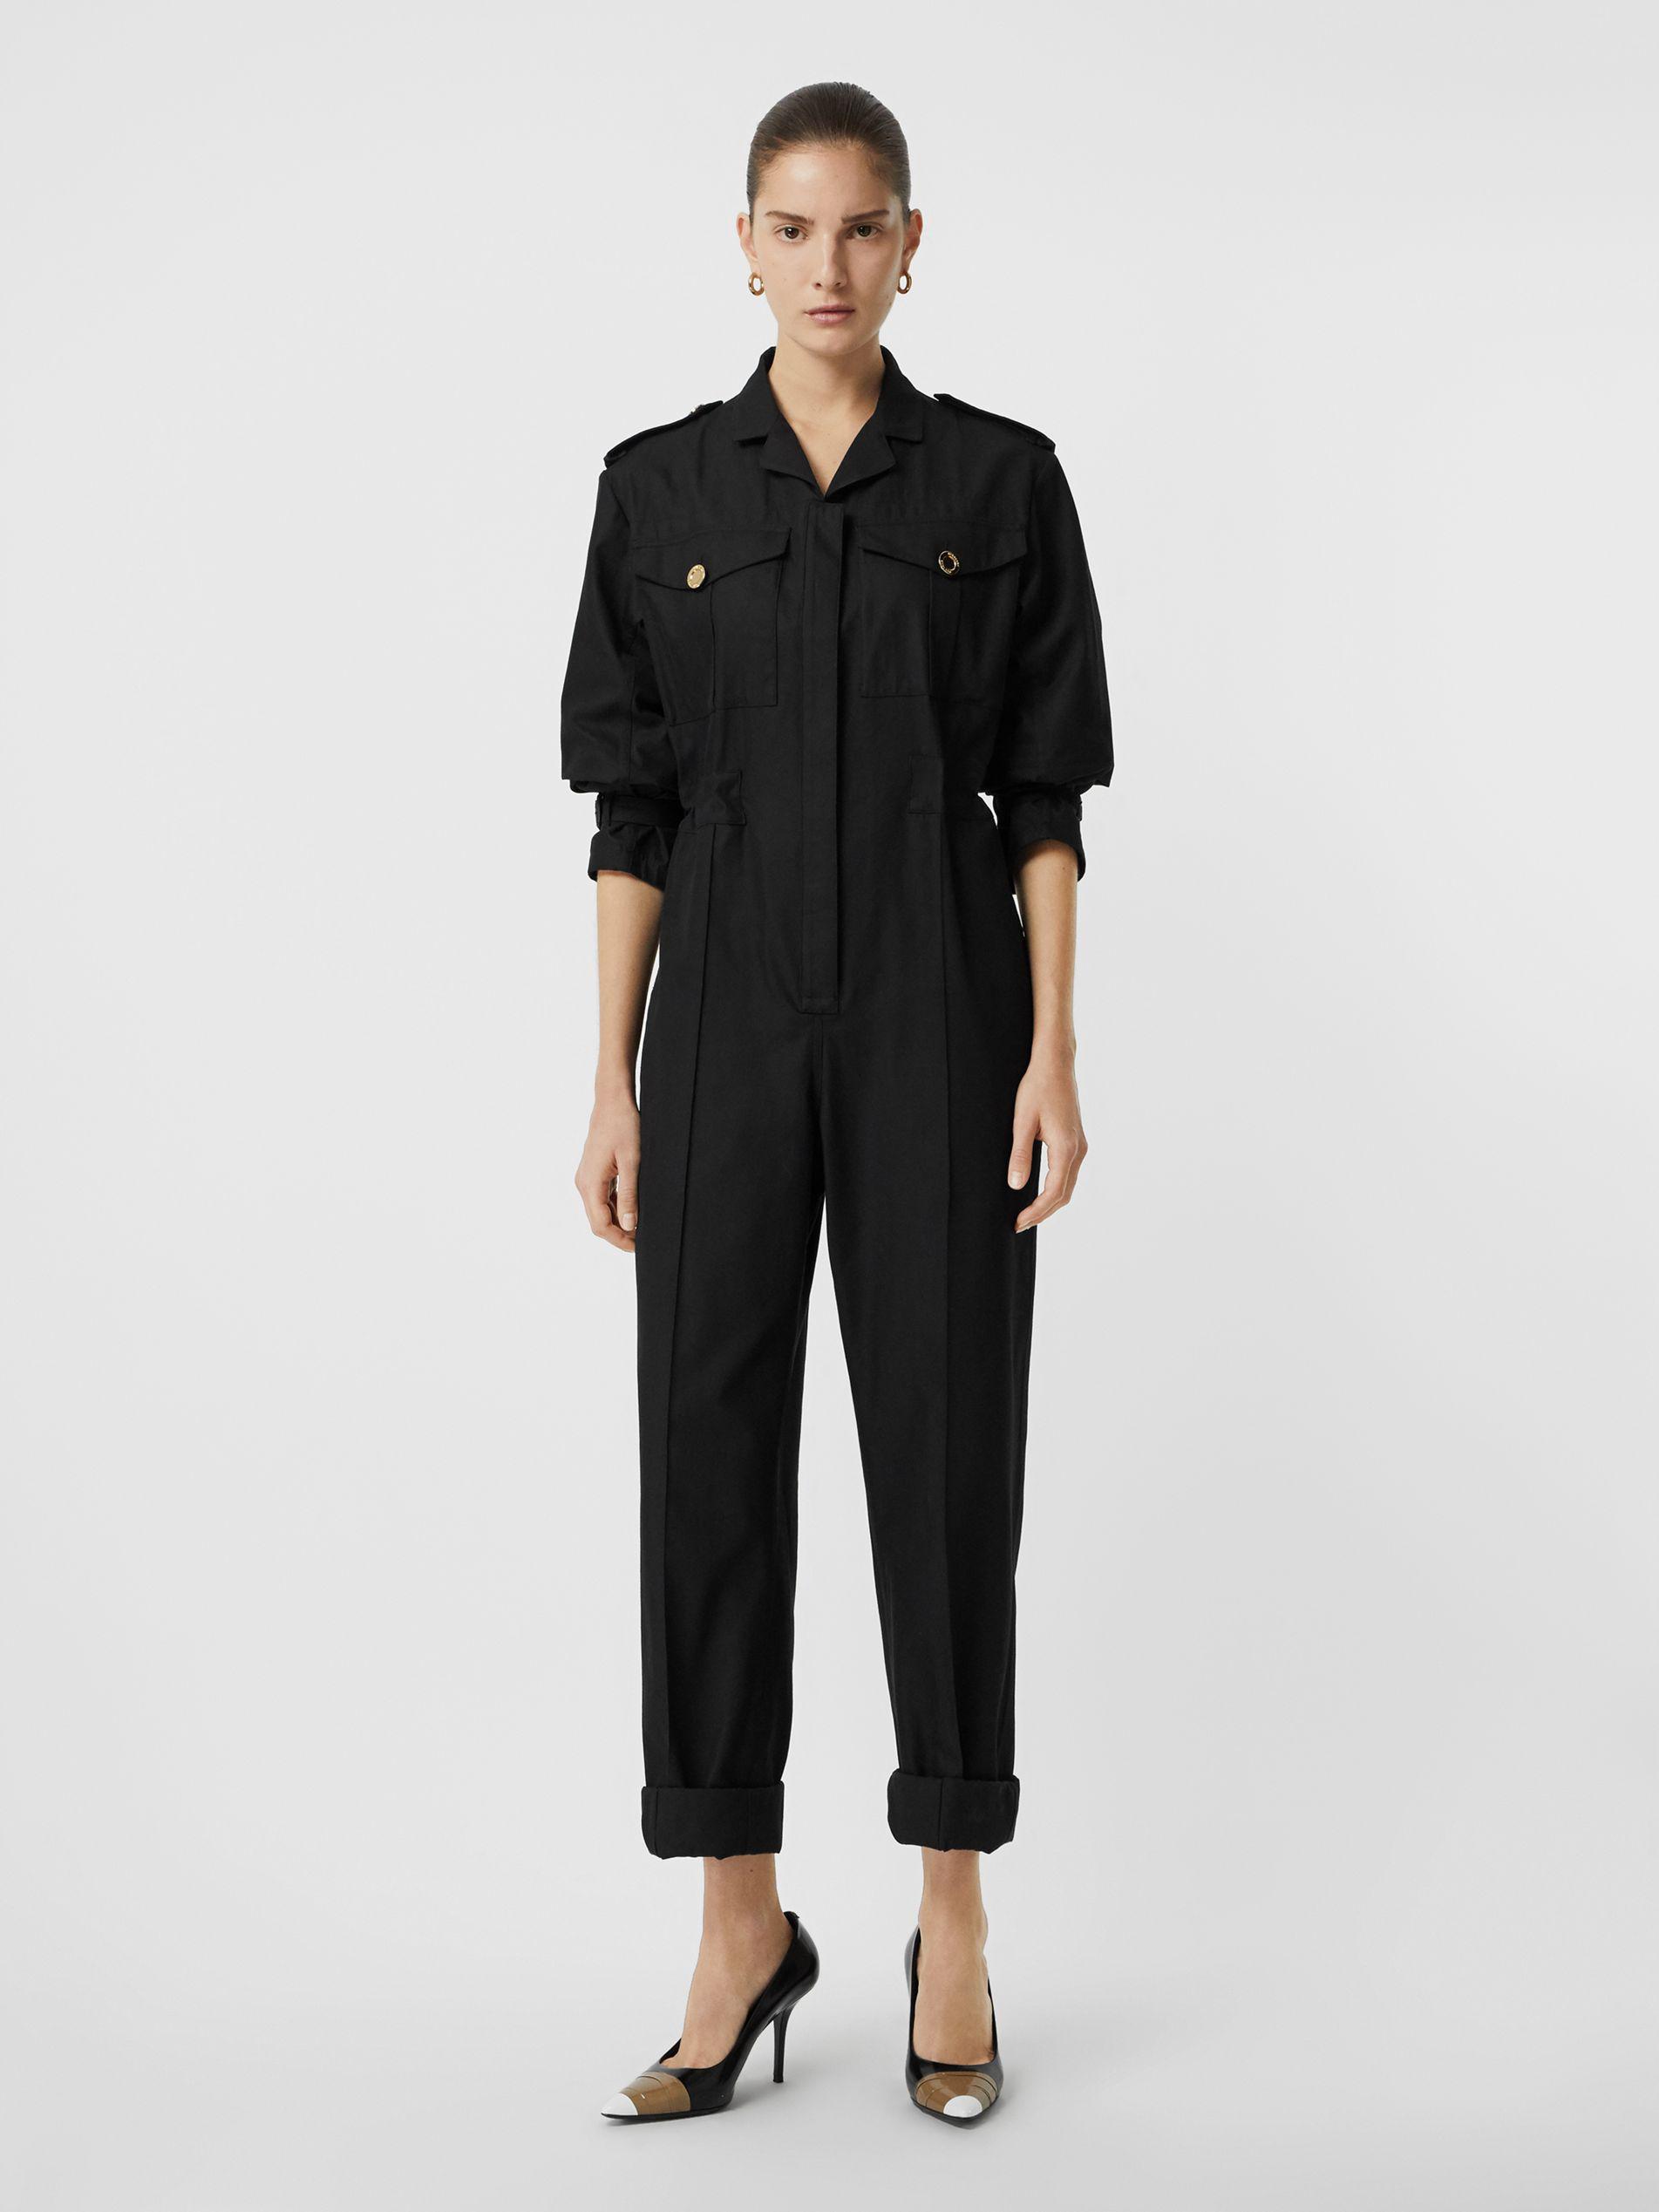 Burberry Cotton Gabardine Jumpsuit In Black